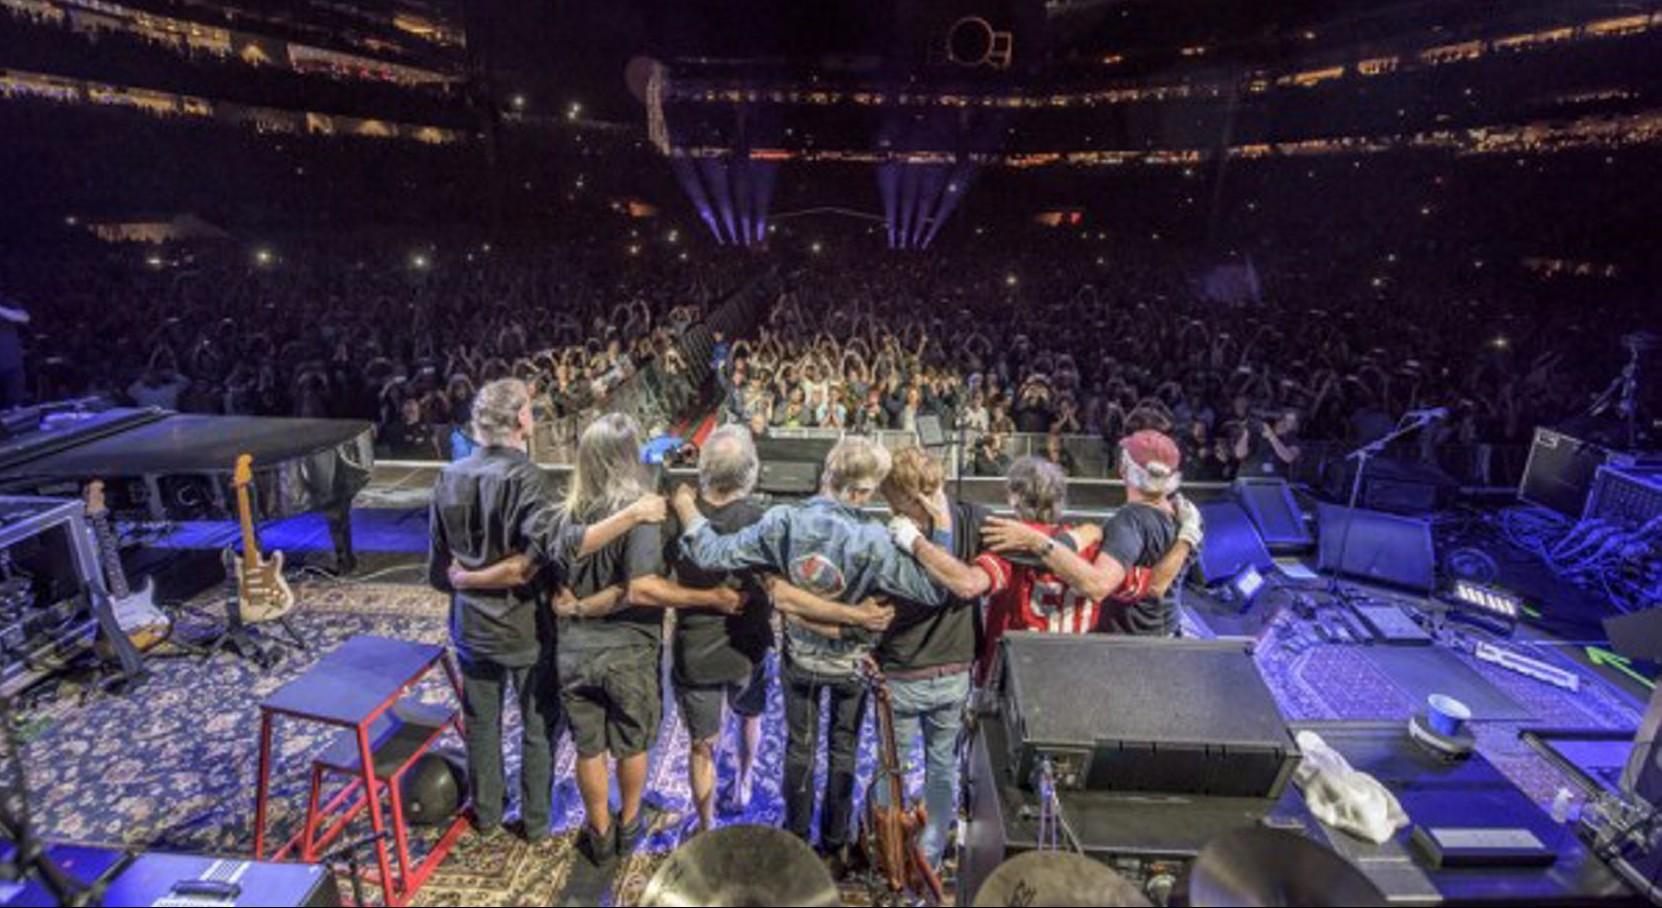 The Grateful Dead will bid us a final good night on Sunday.